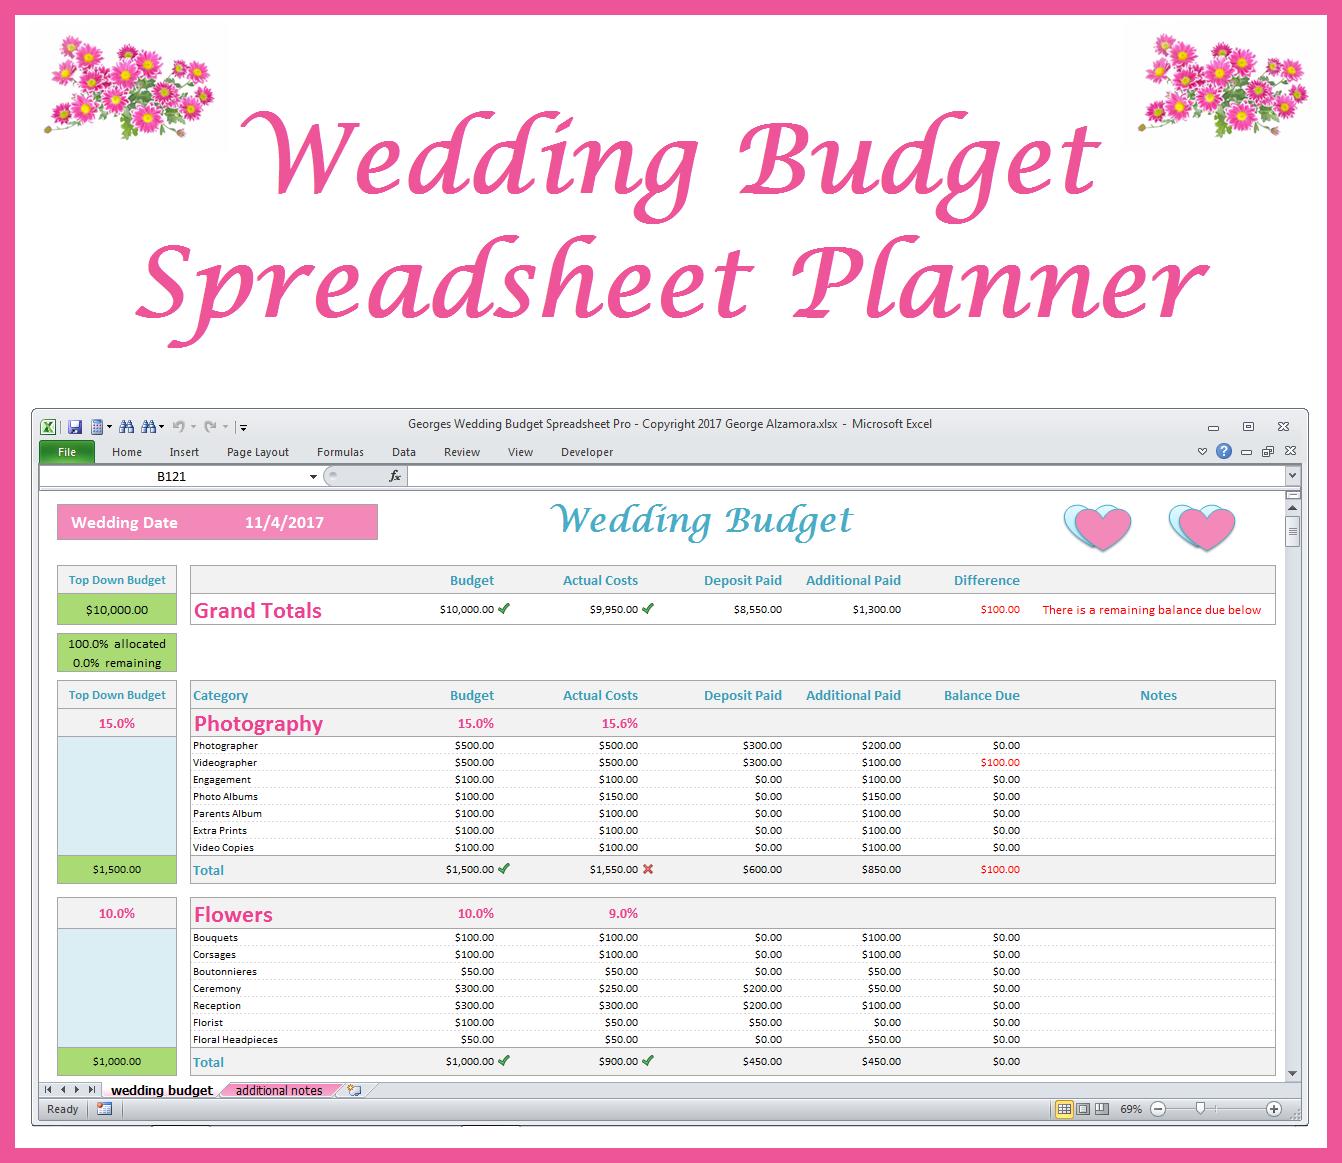 Georges Wedding Budget Spreadsheet Pro V2.0